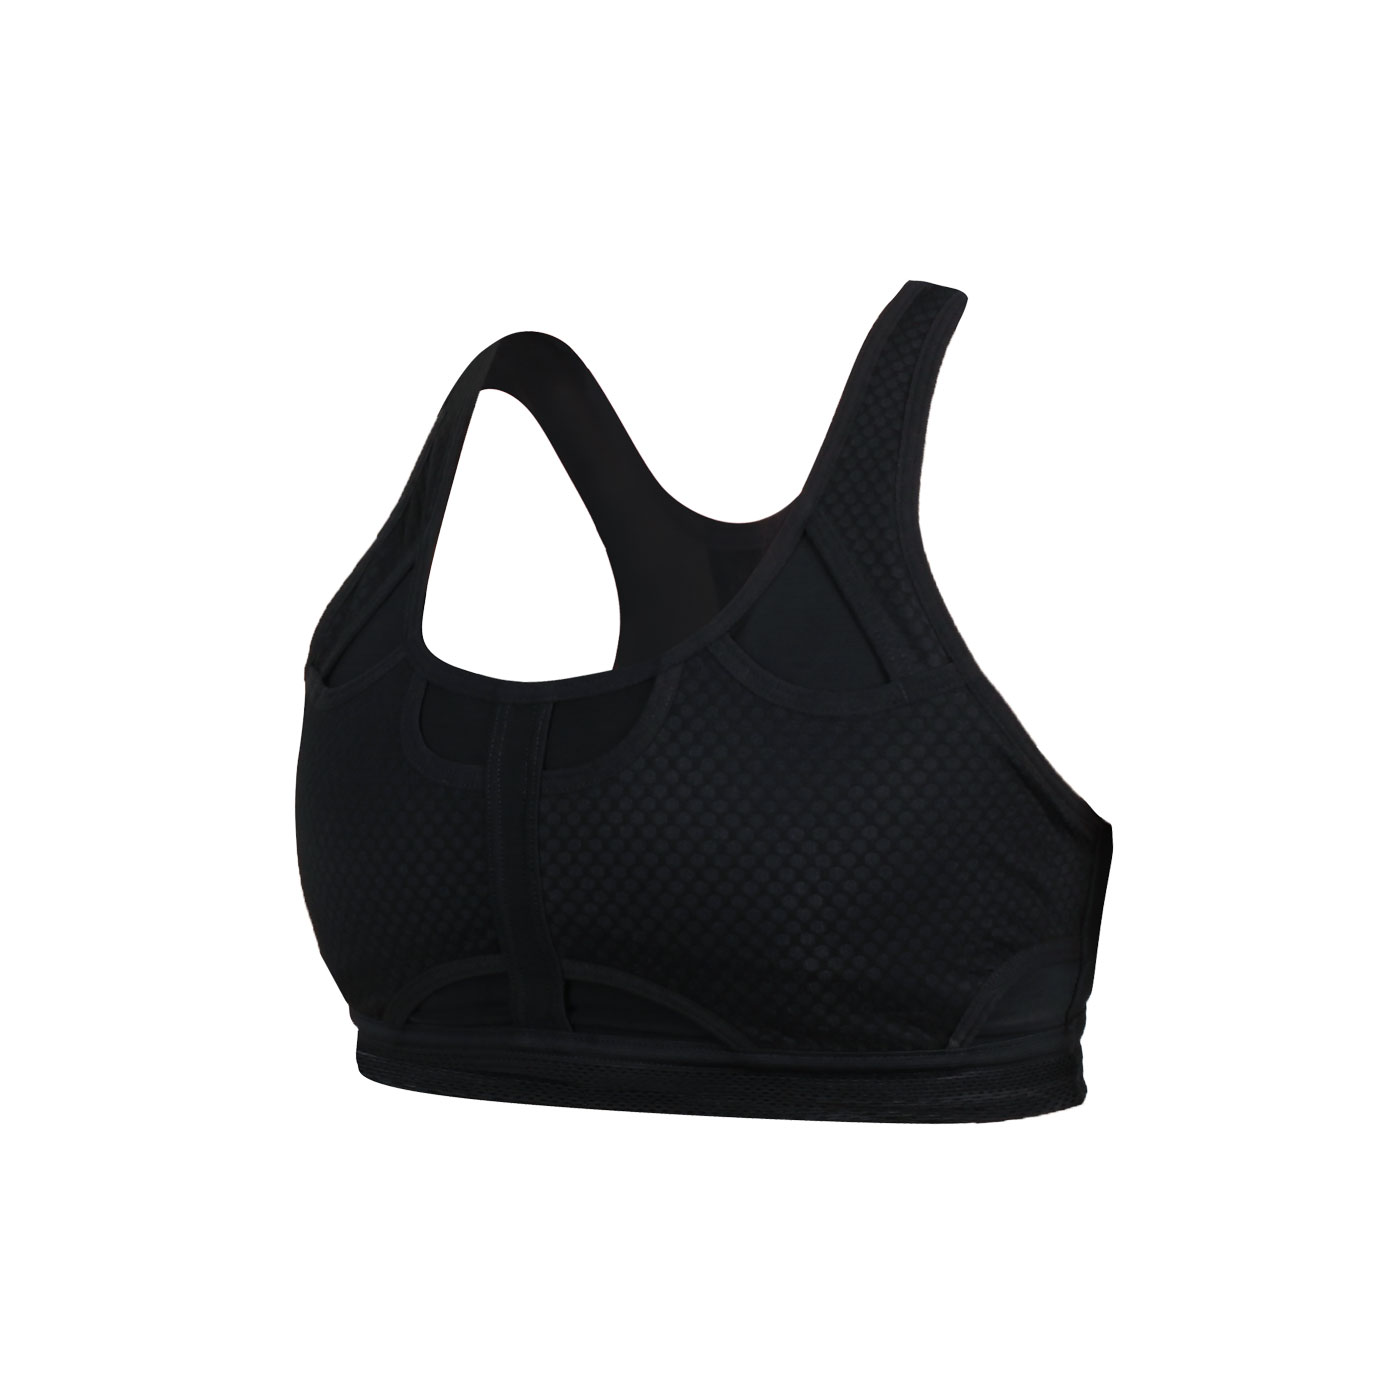 NIKE 女款中度支撐運動內衣 CJ0150-010 - 黑銀